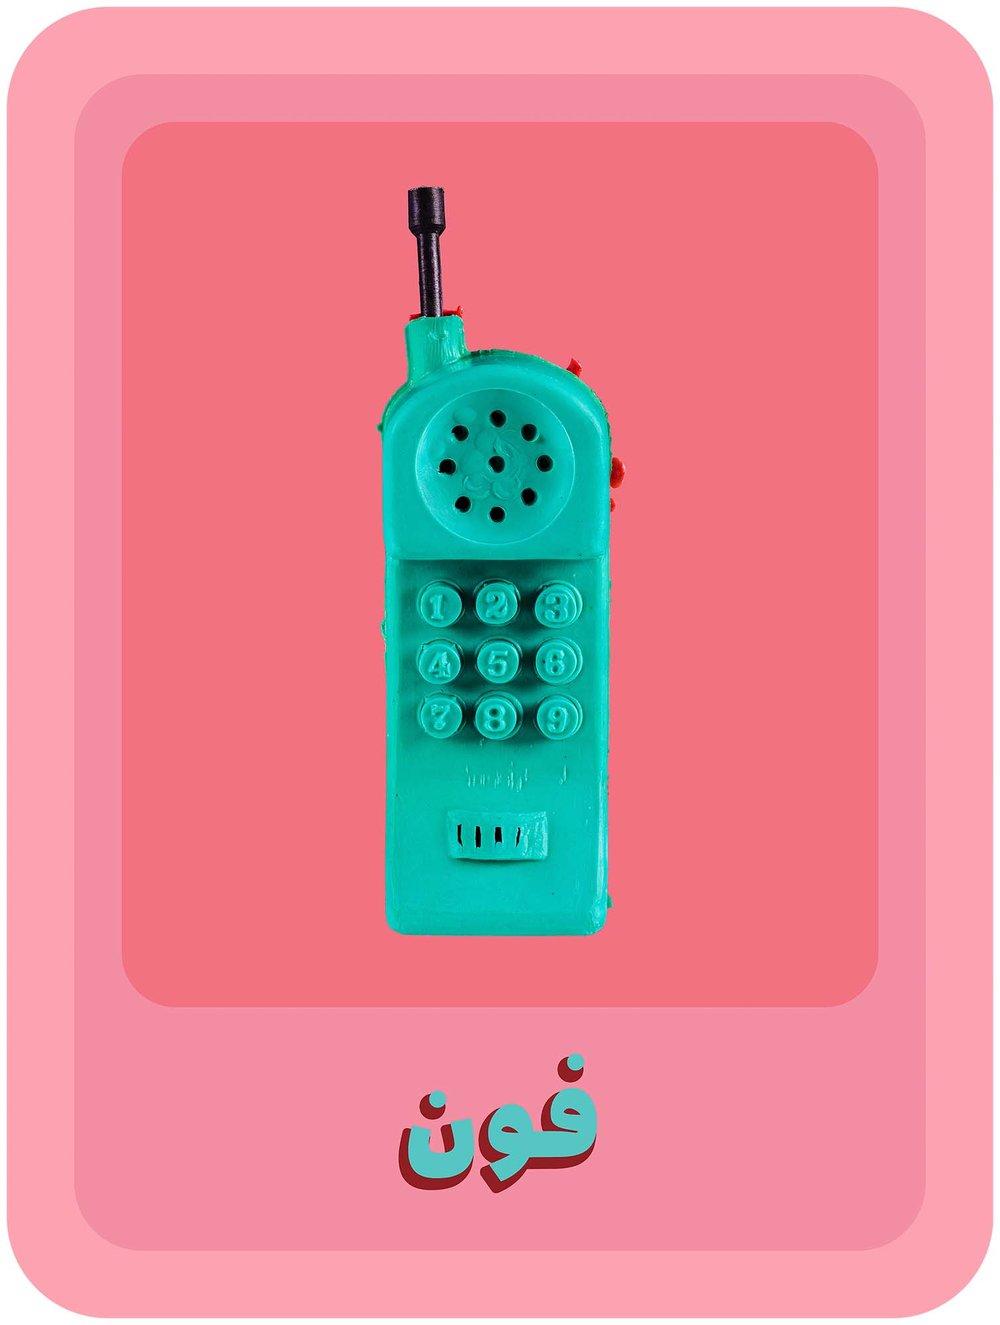 Mobile Phone #1